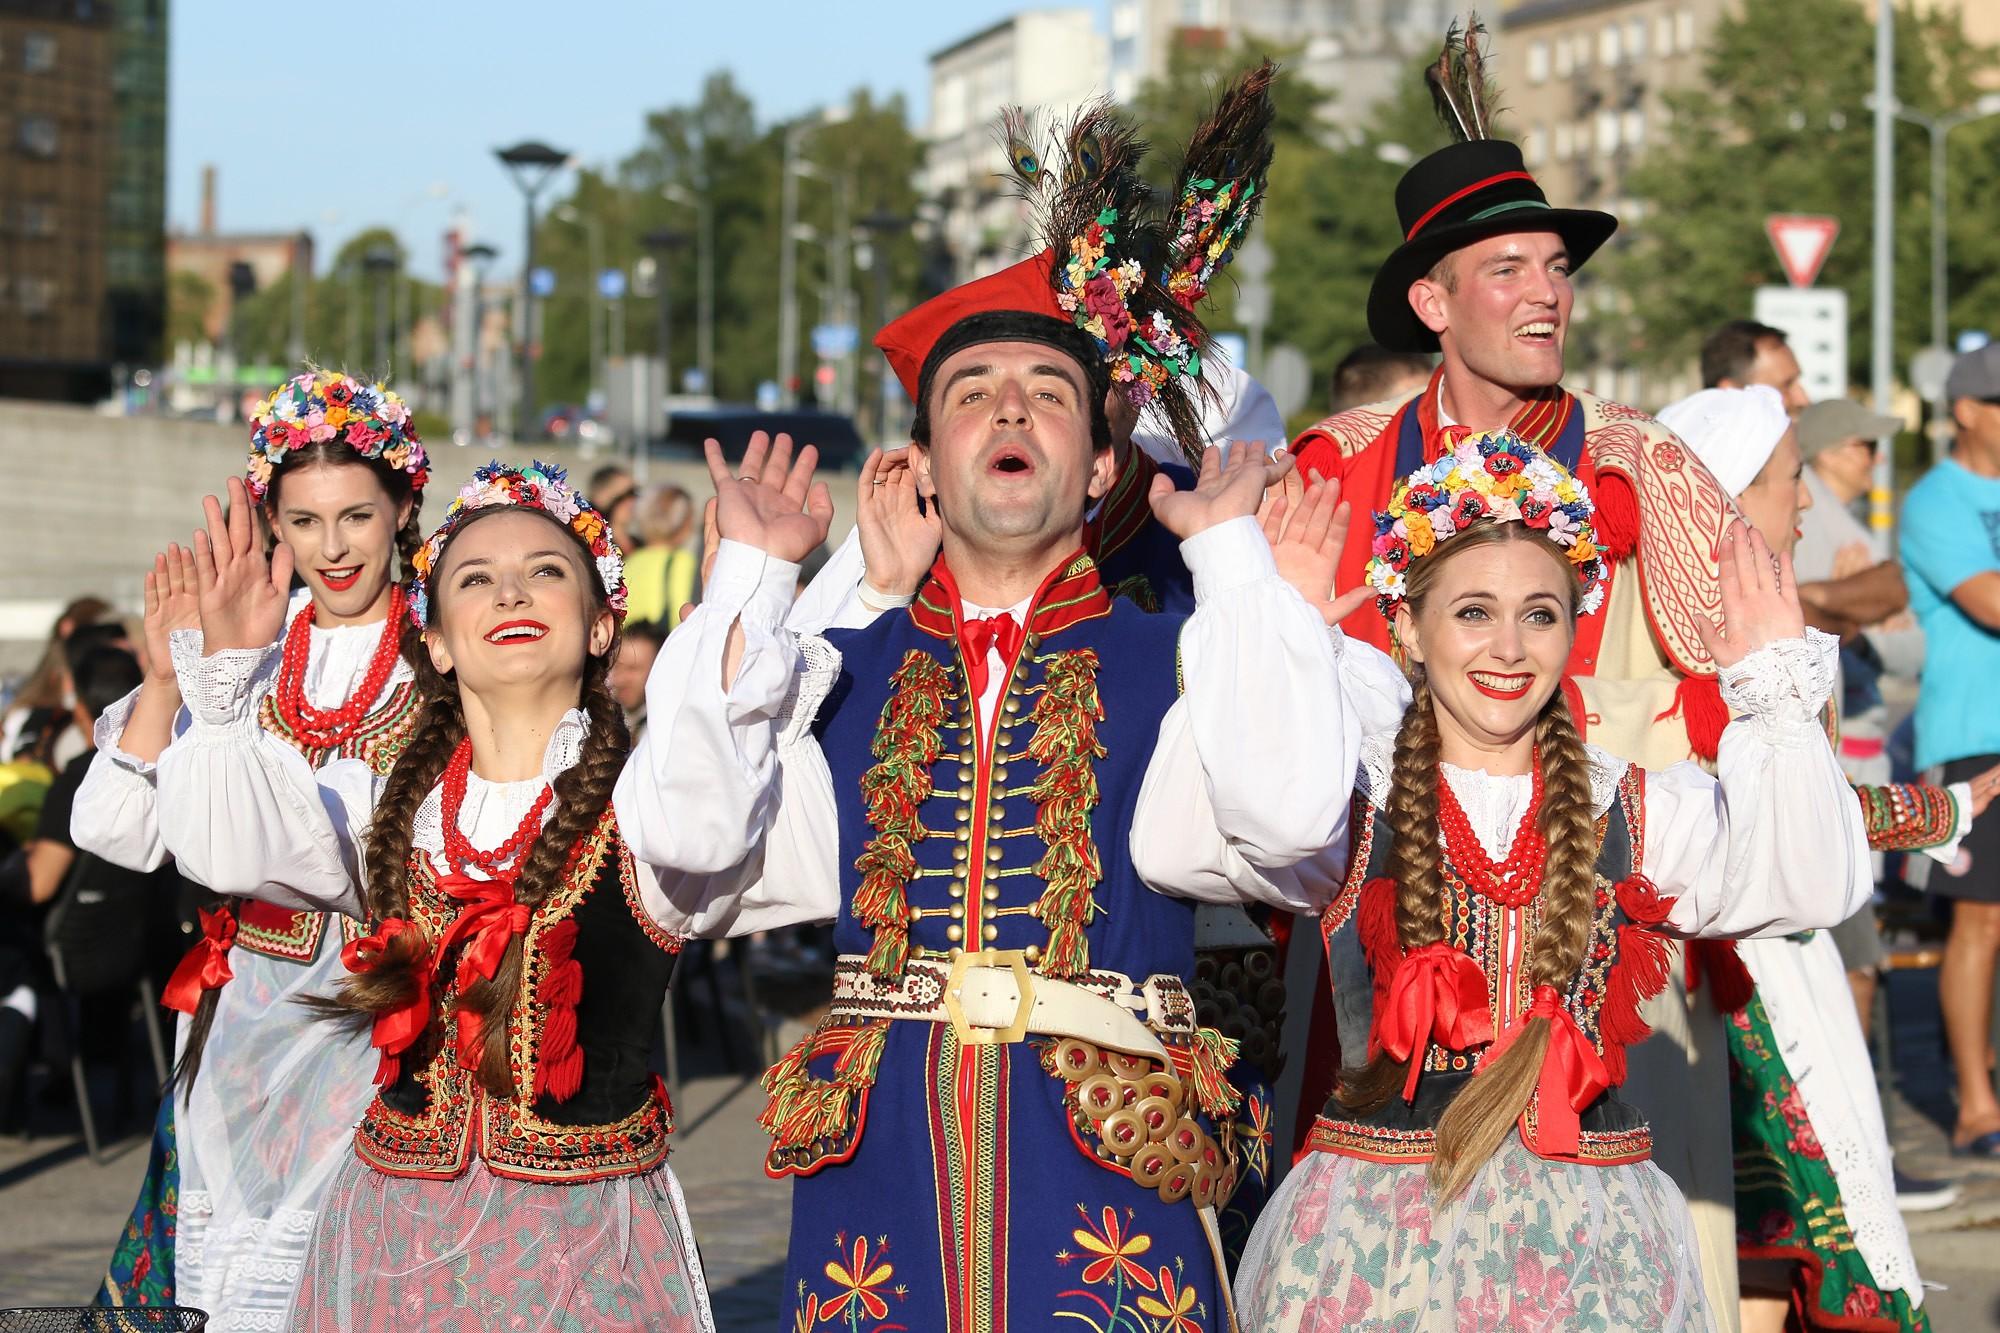 Priecē dažādu tautu deju solis